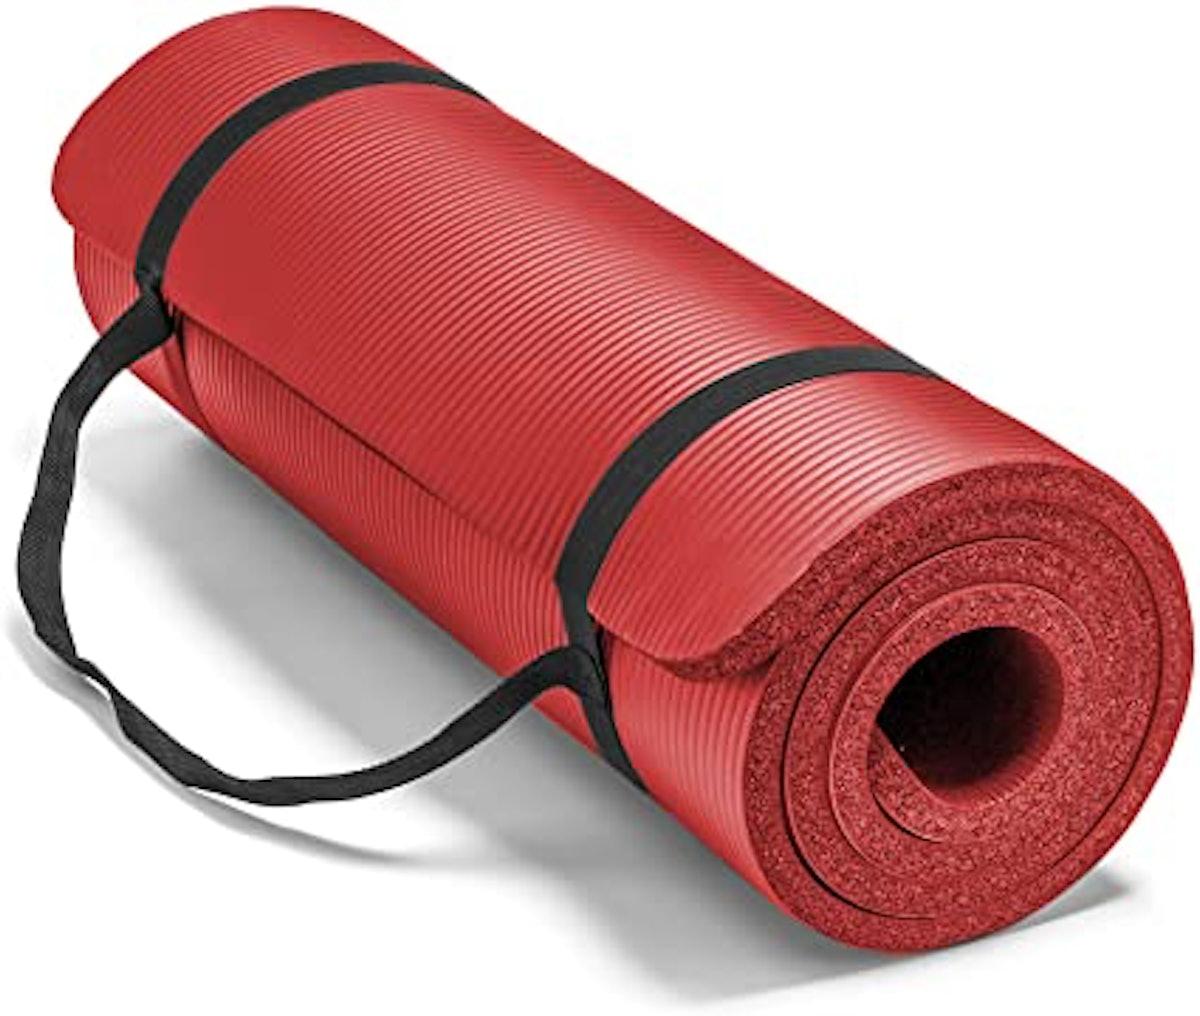 Spoga Extra Thick High Density Yoga Mat